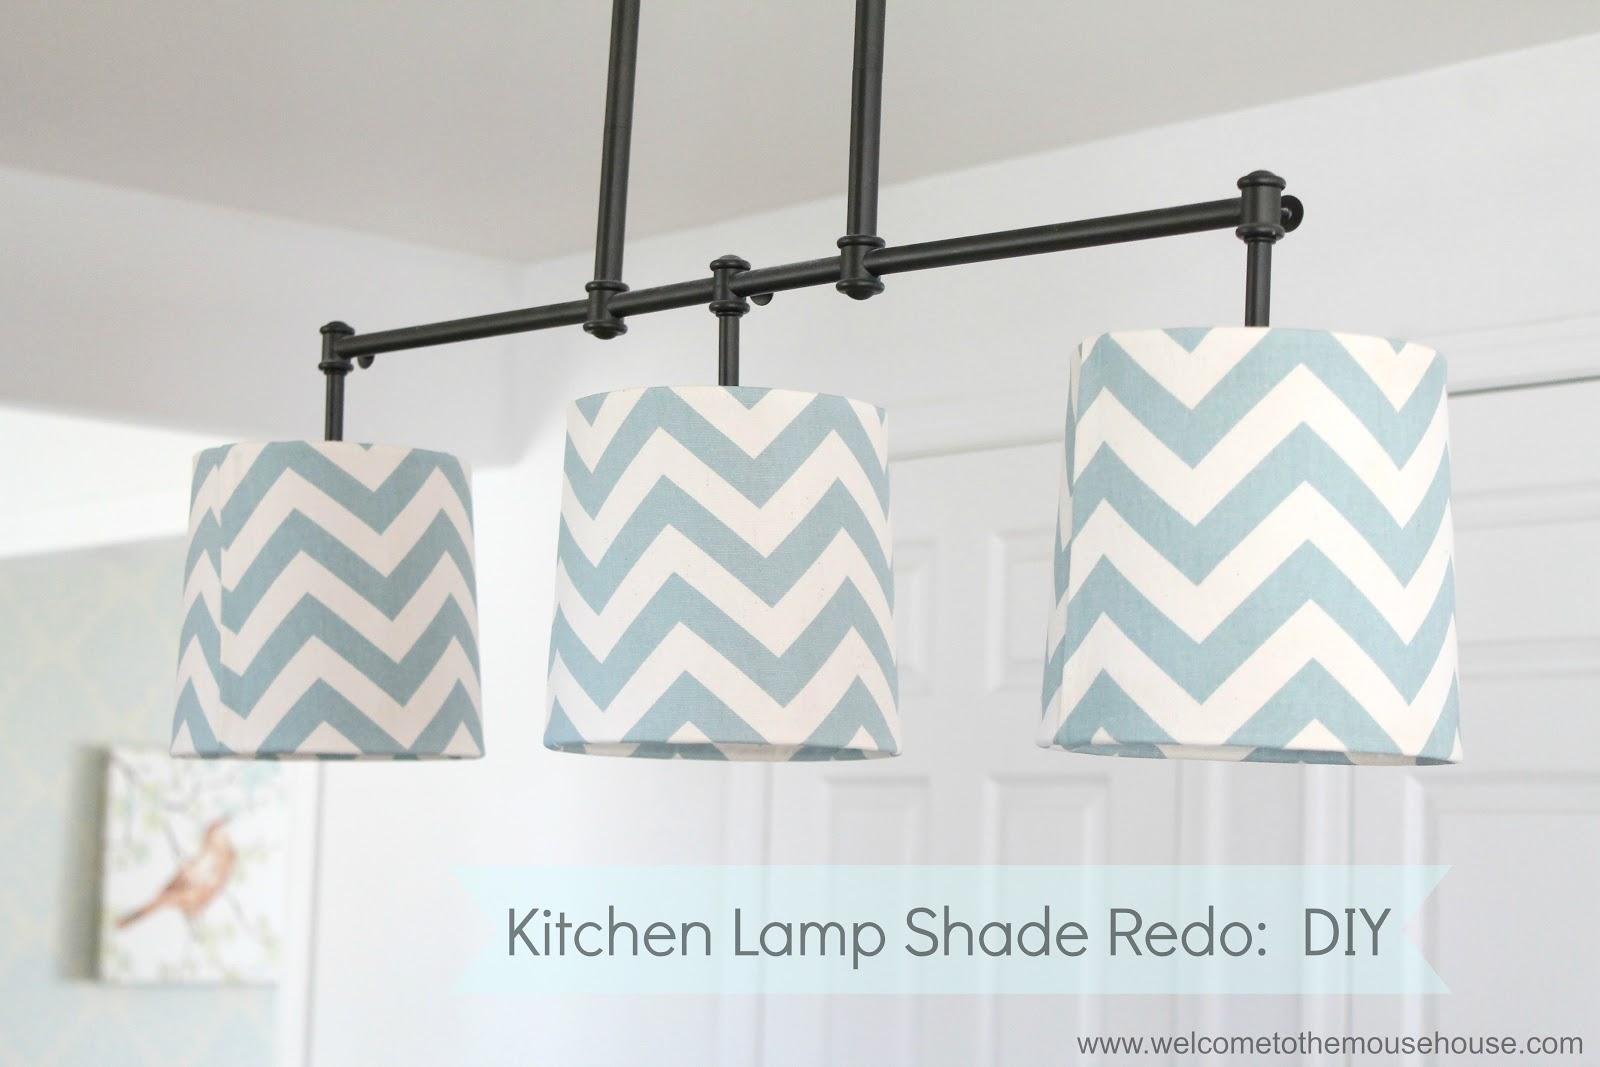 Chevron Kitchen Lamp Shade Redo: DIY ...